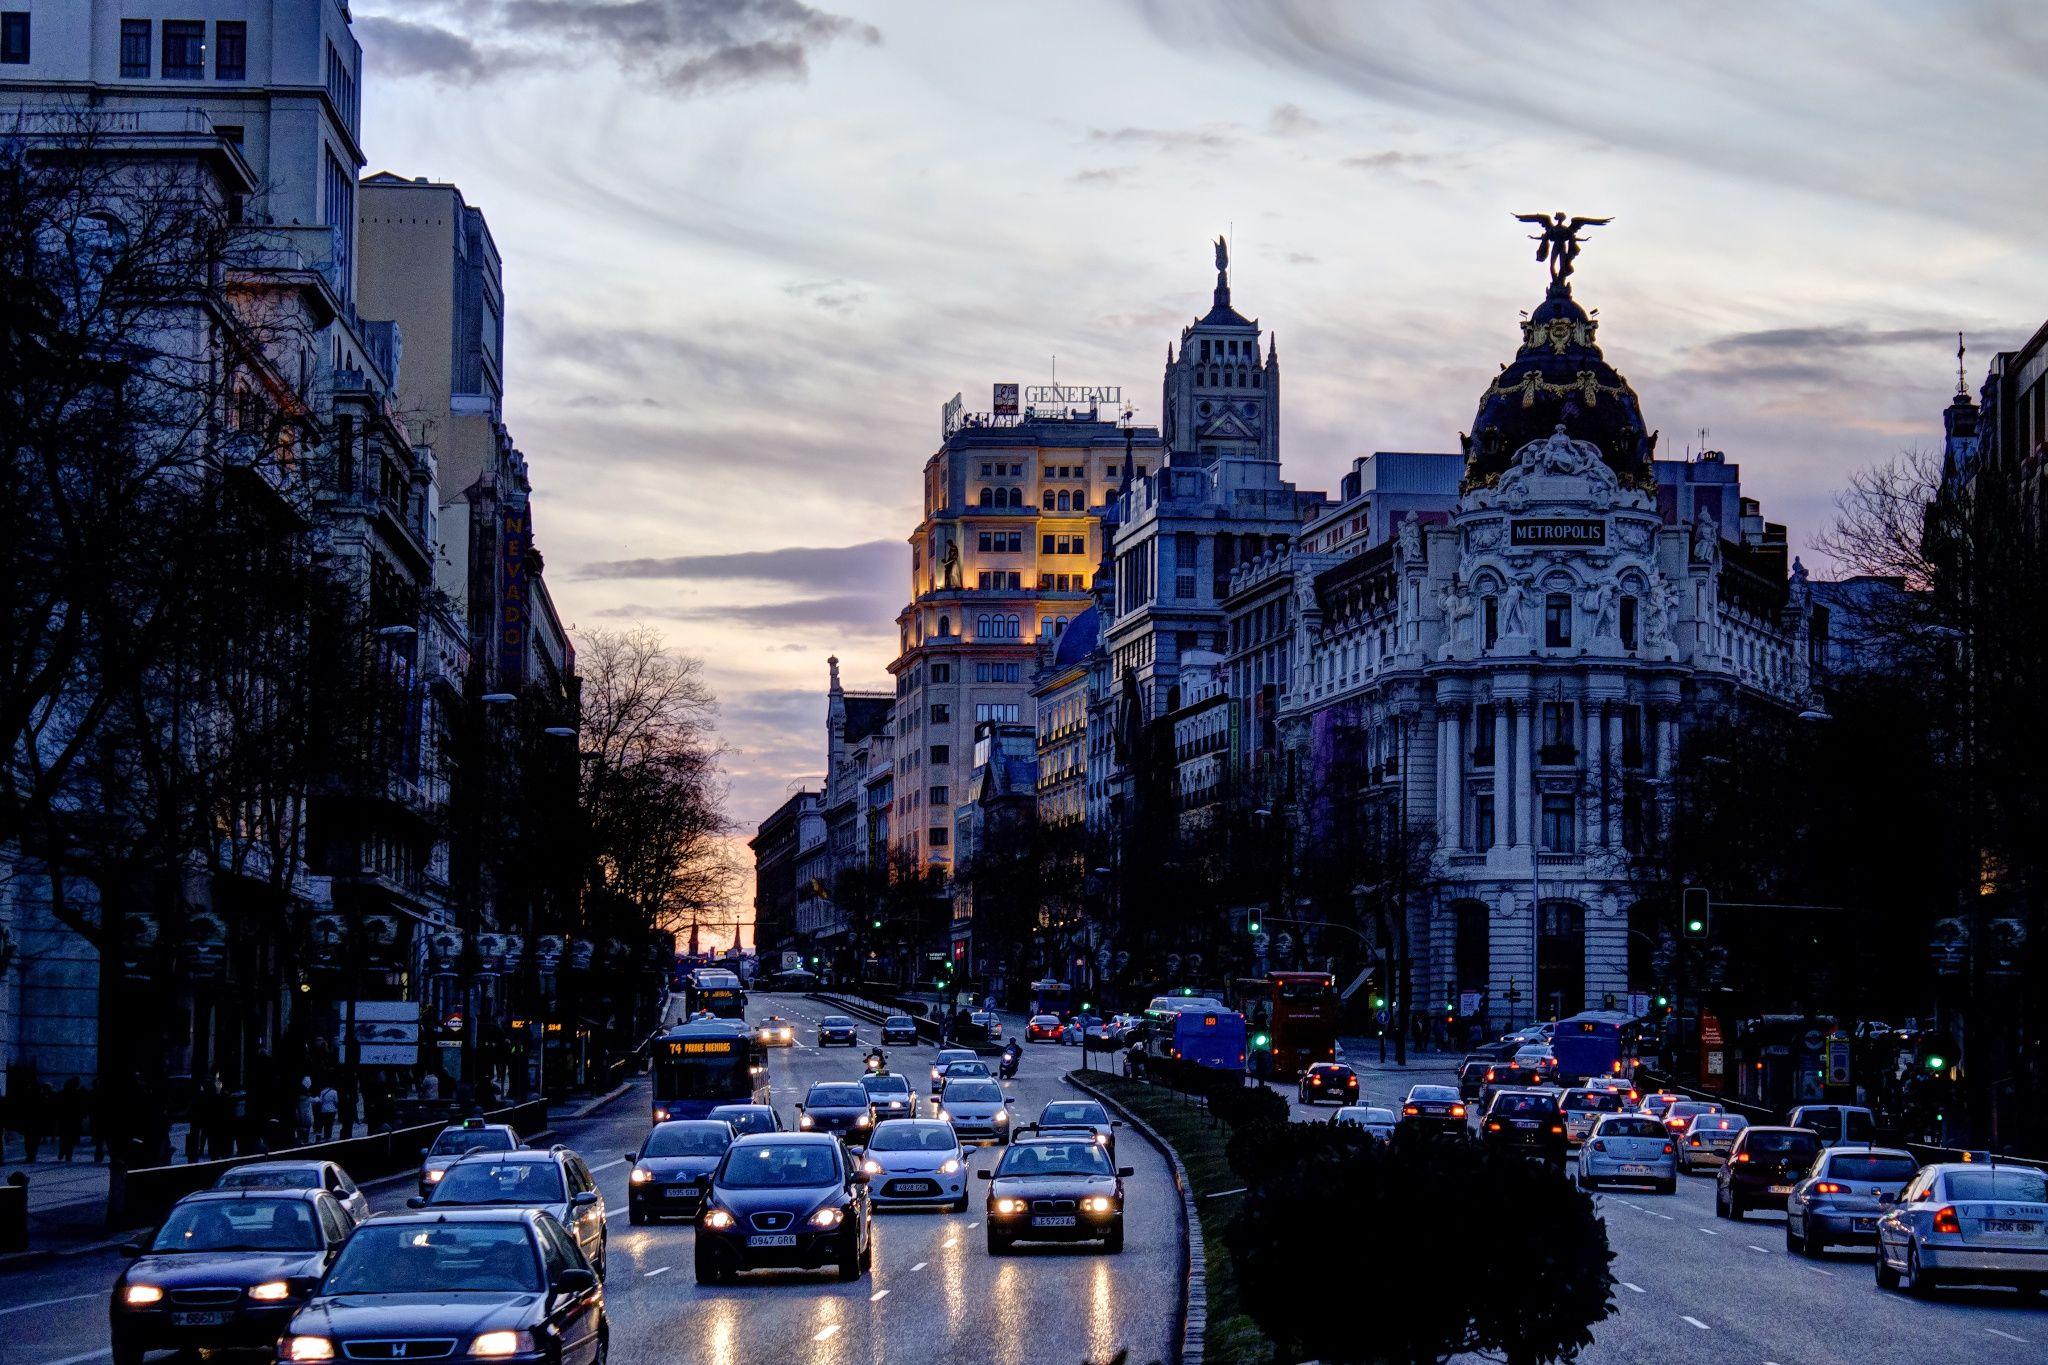 Calle de Alcalá. Madrid by Raúl Gómez